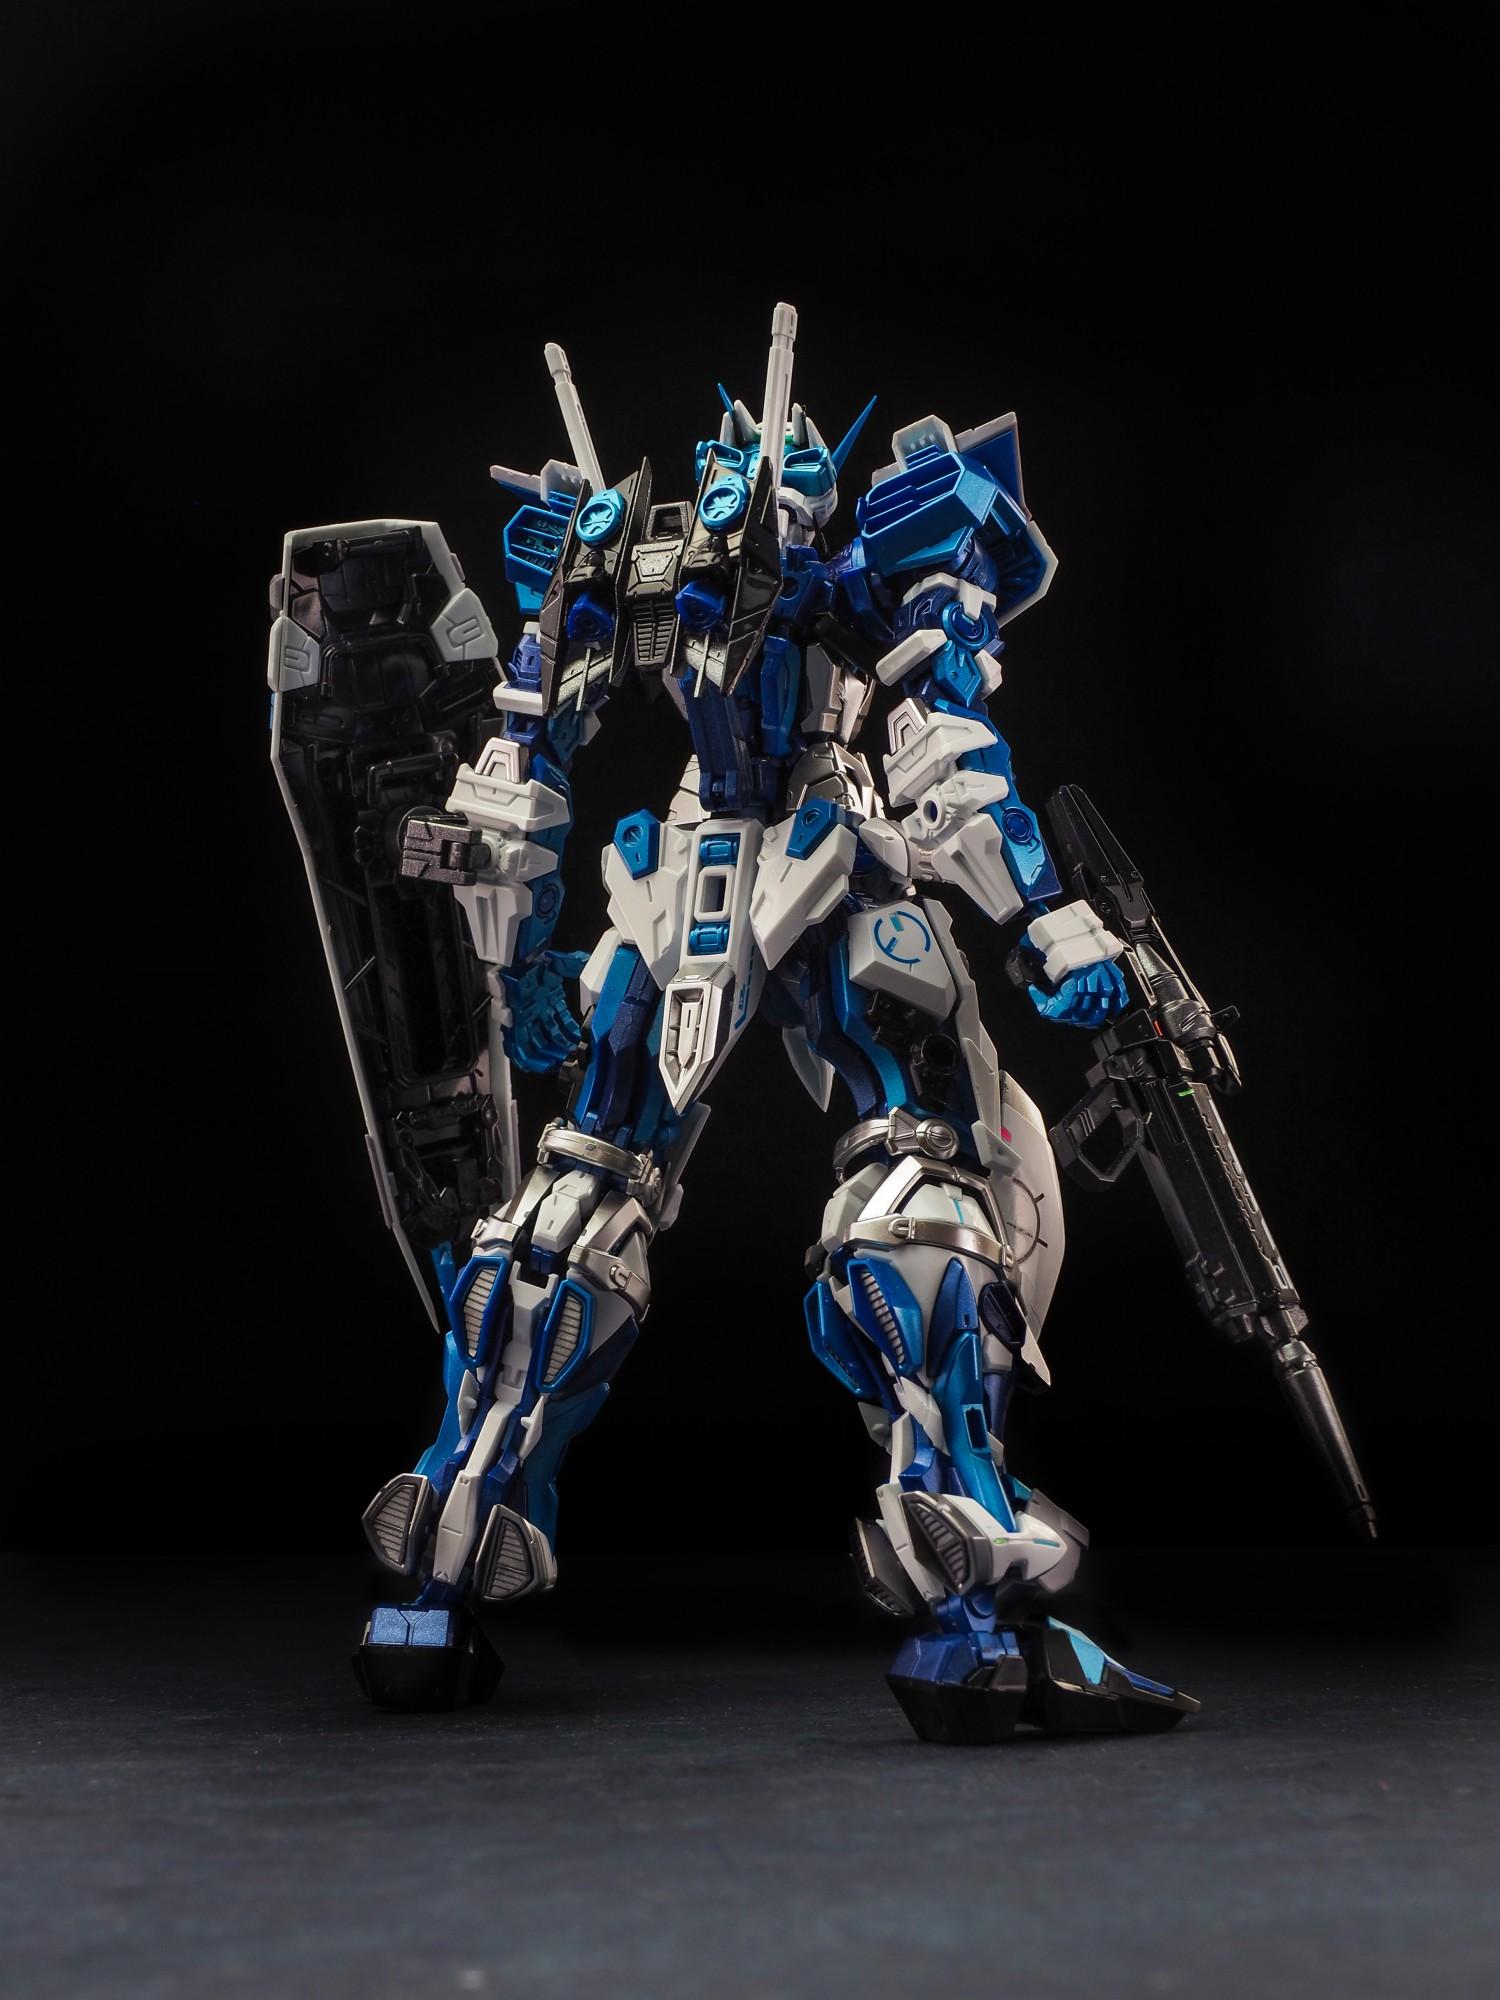 S367_8810_astray_blue_016.jpg